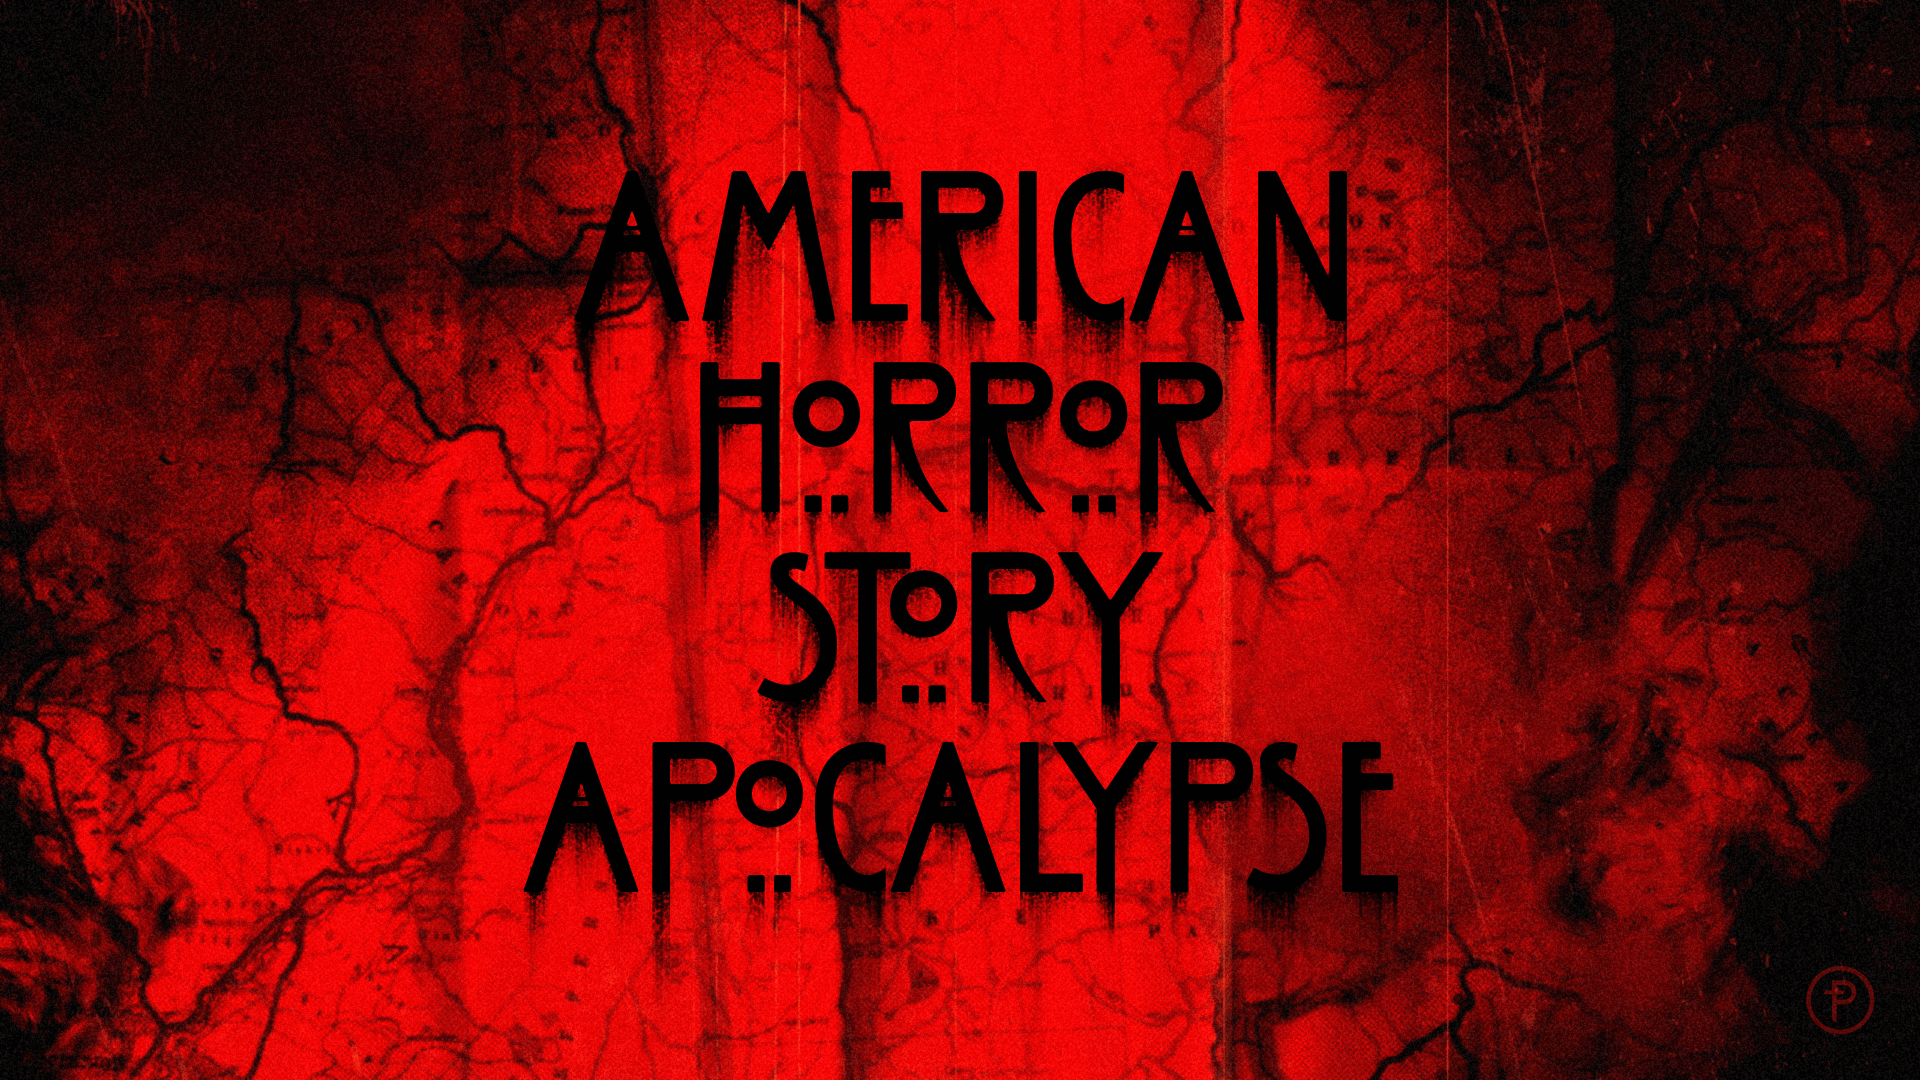 AHS_Apocalypse_001.png